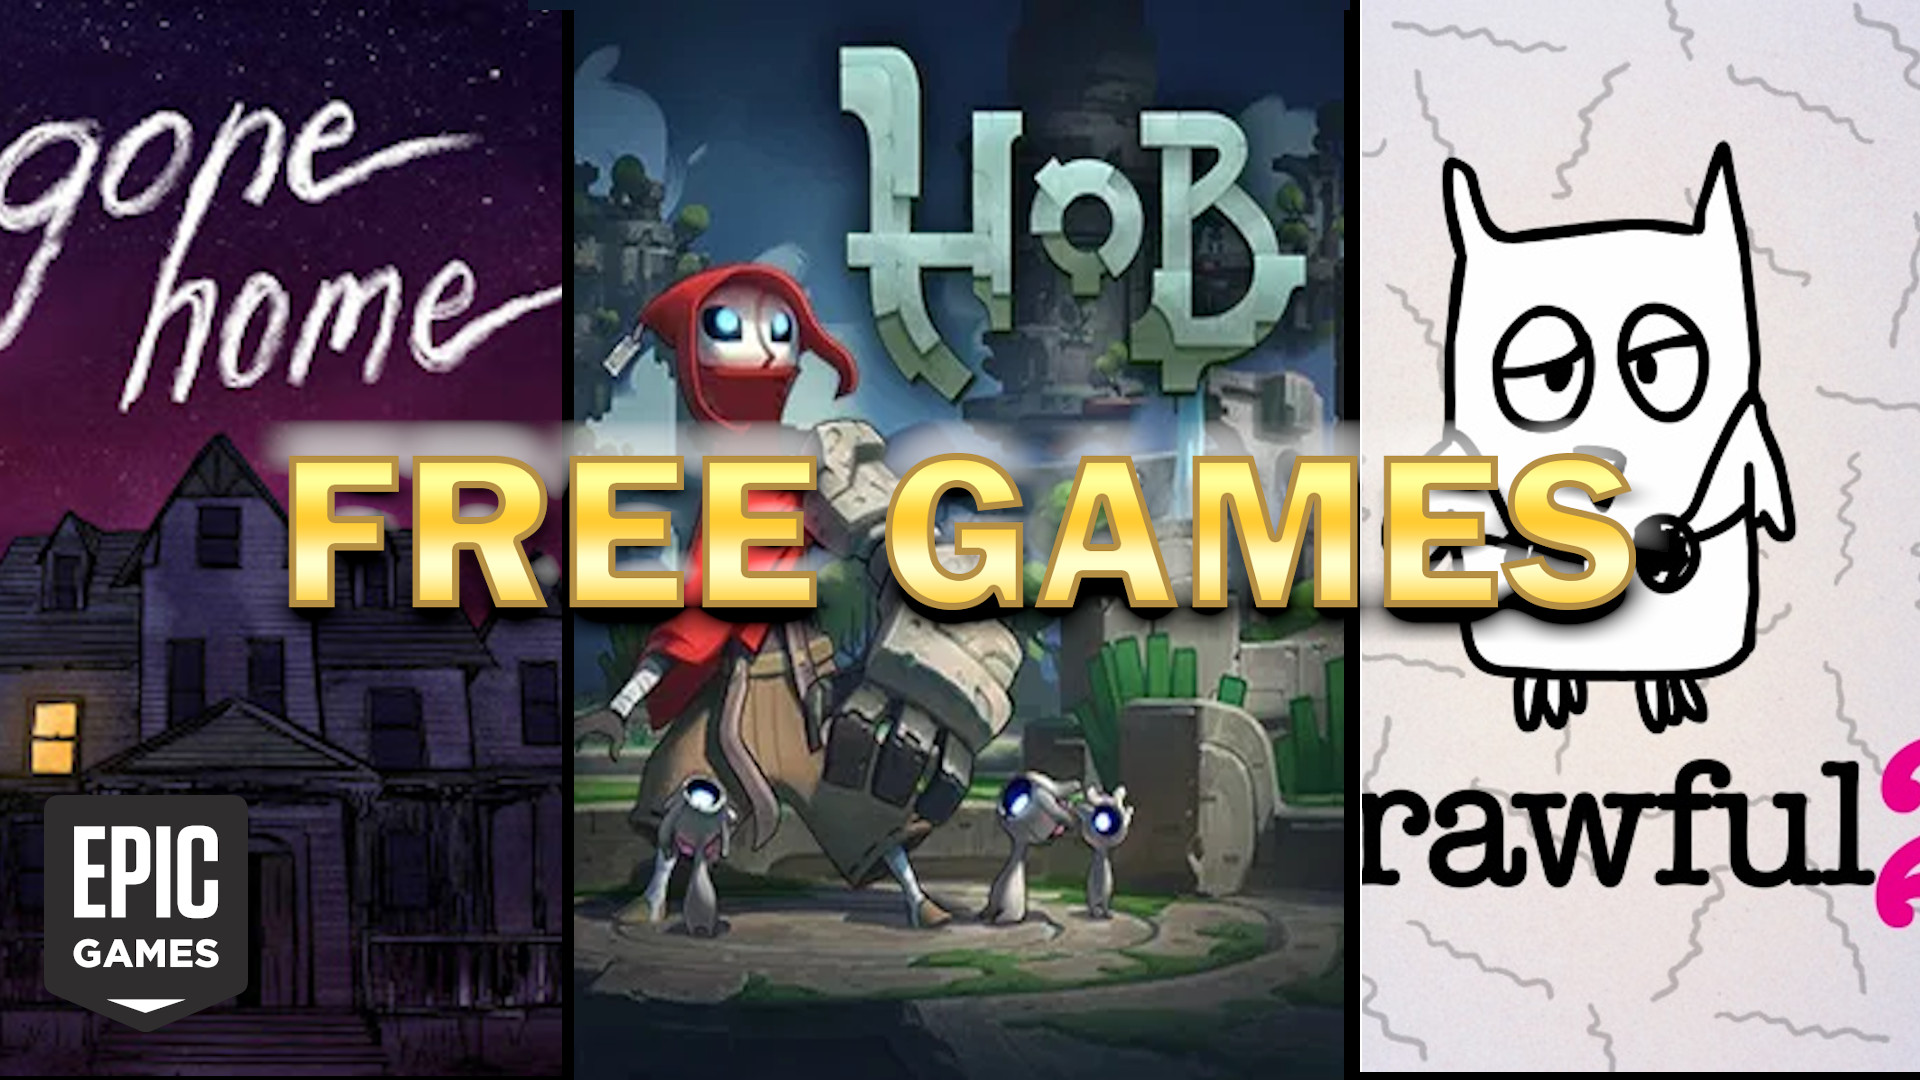 free epic games